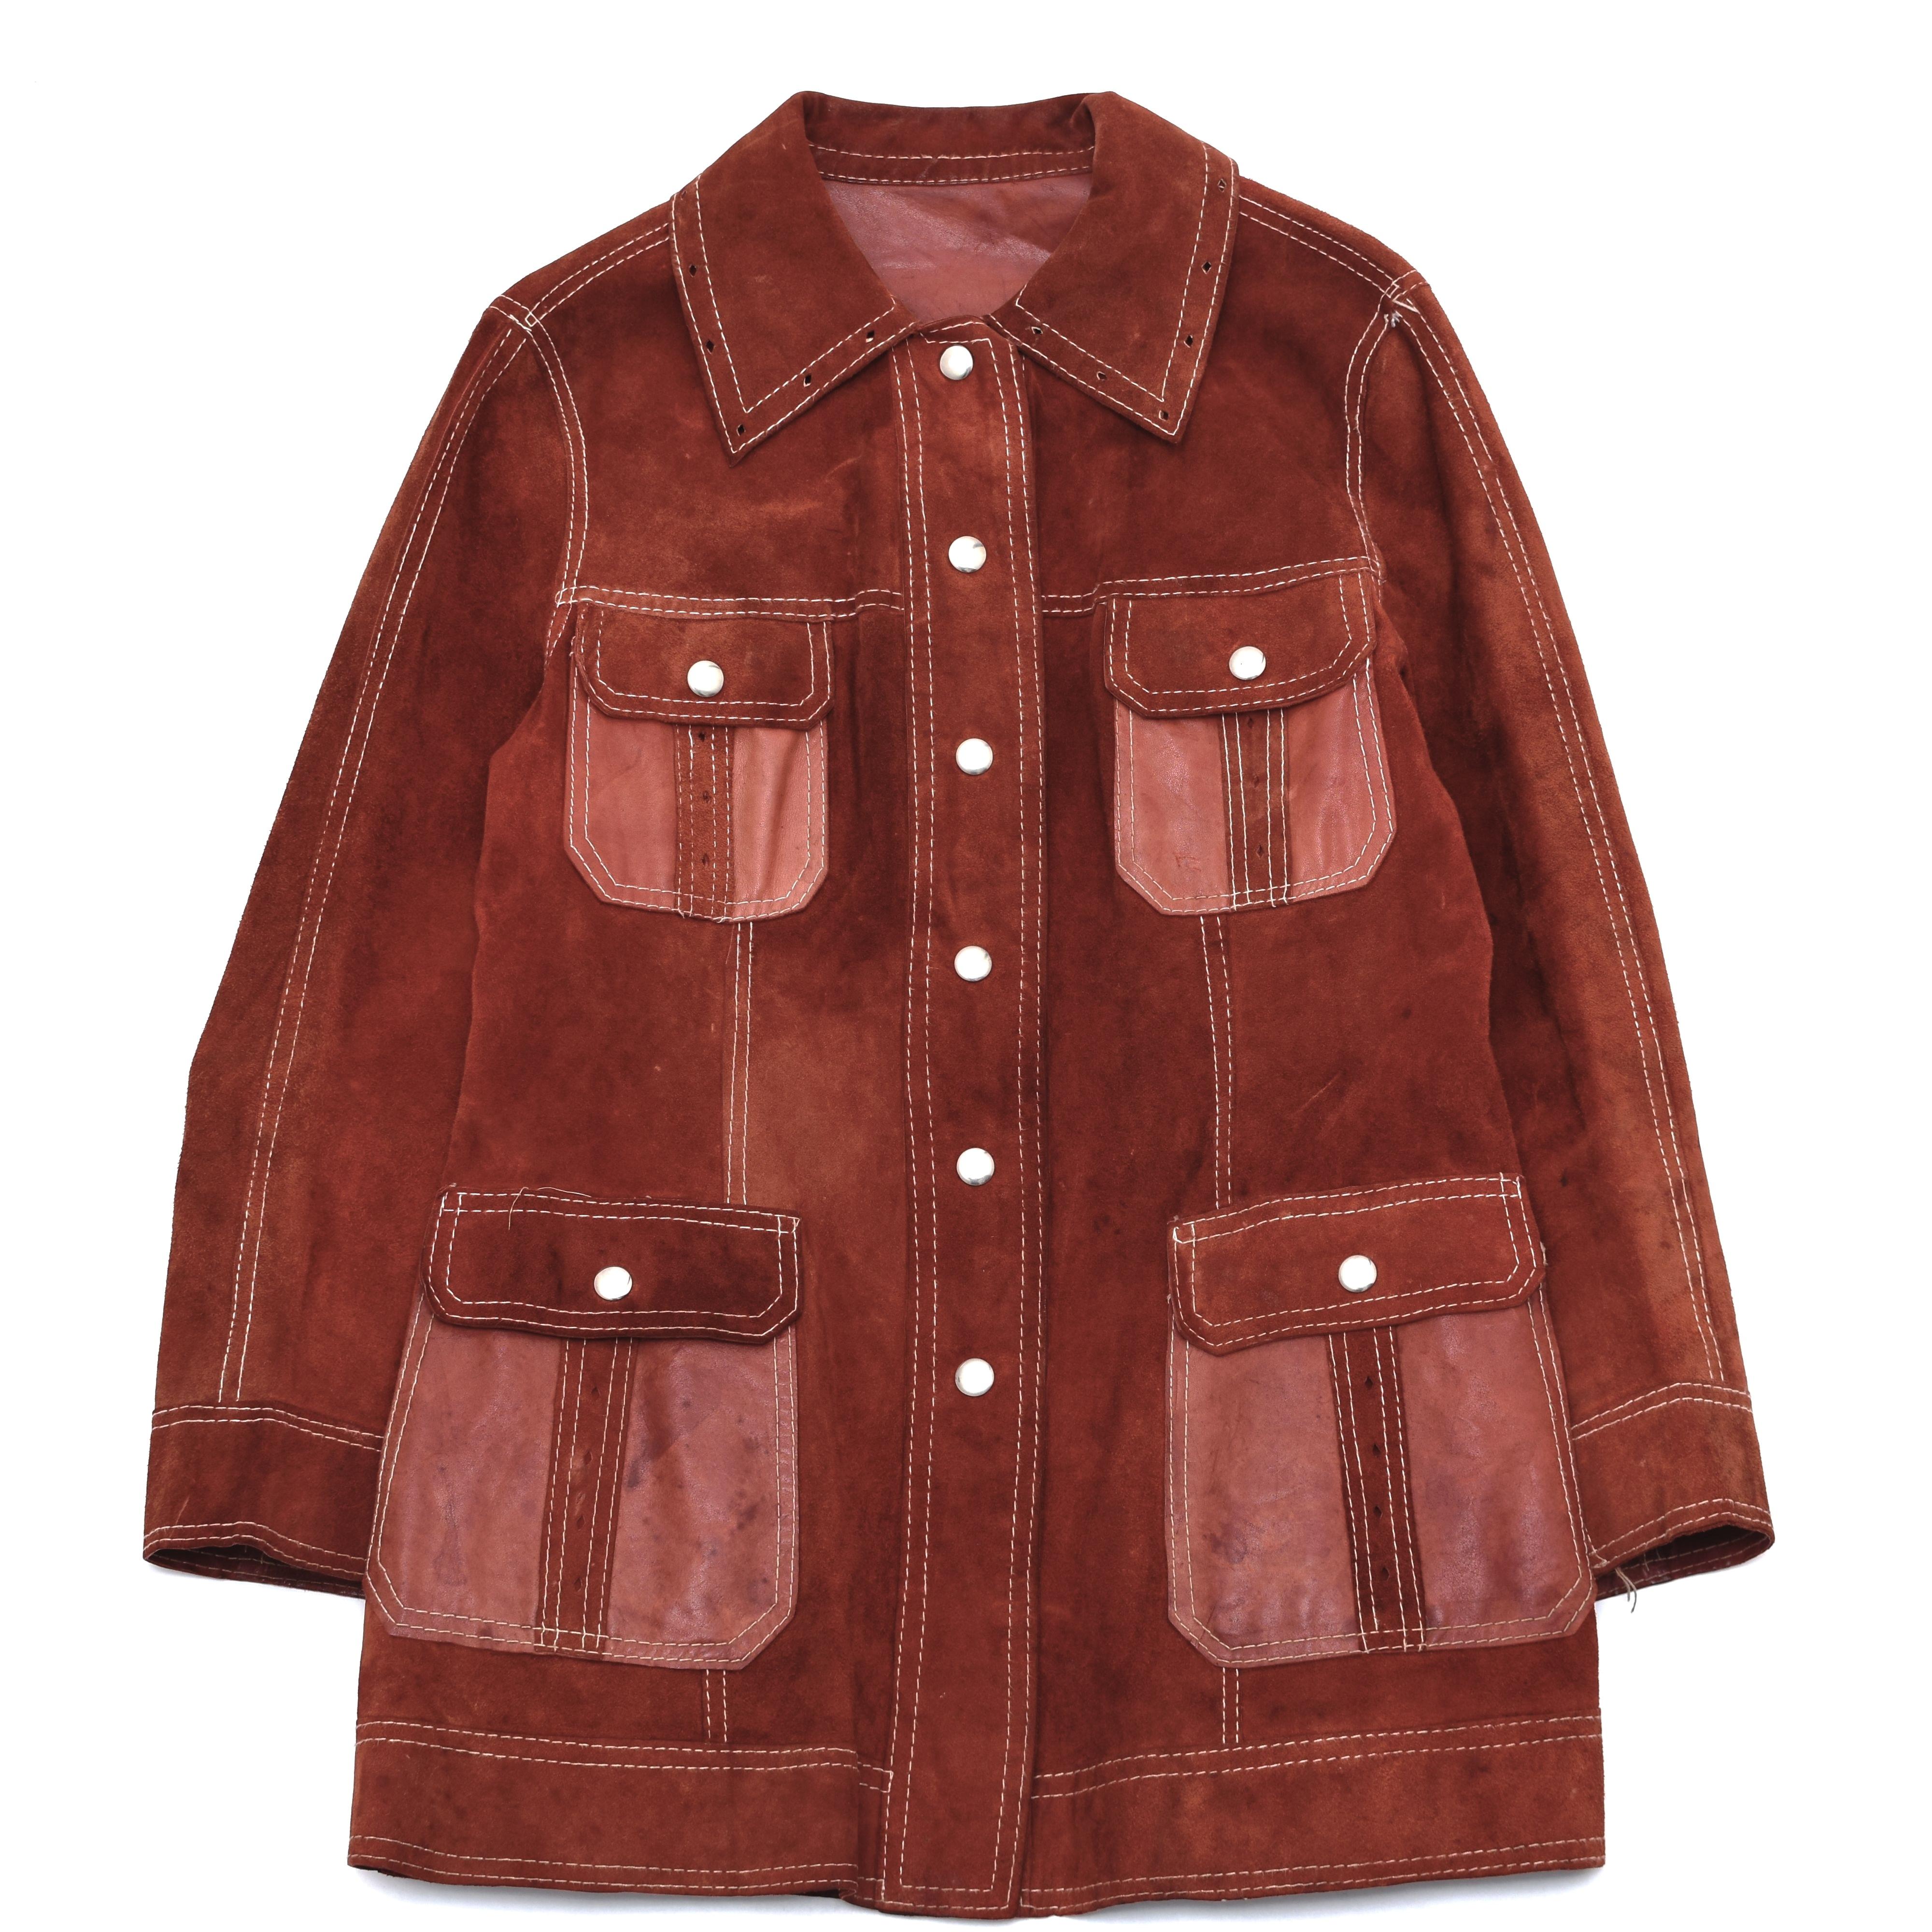 Vintage reversible leather jacket